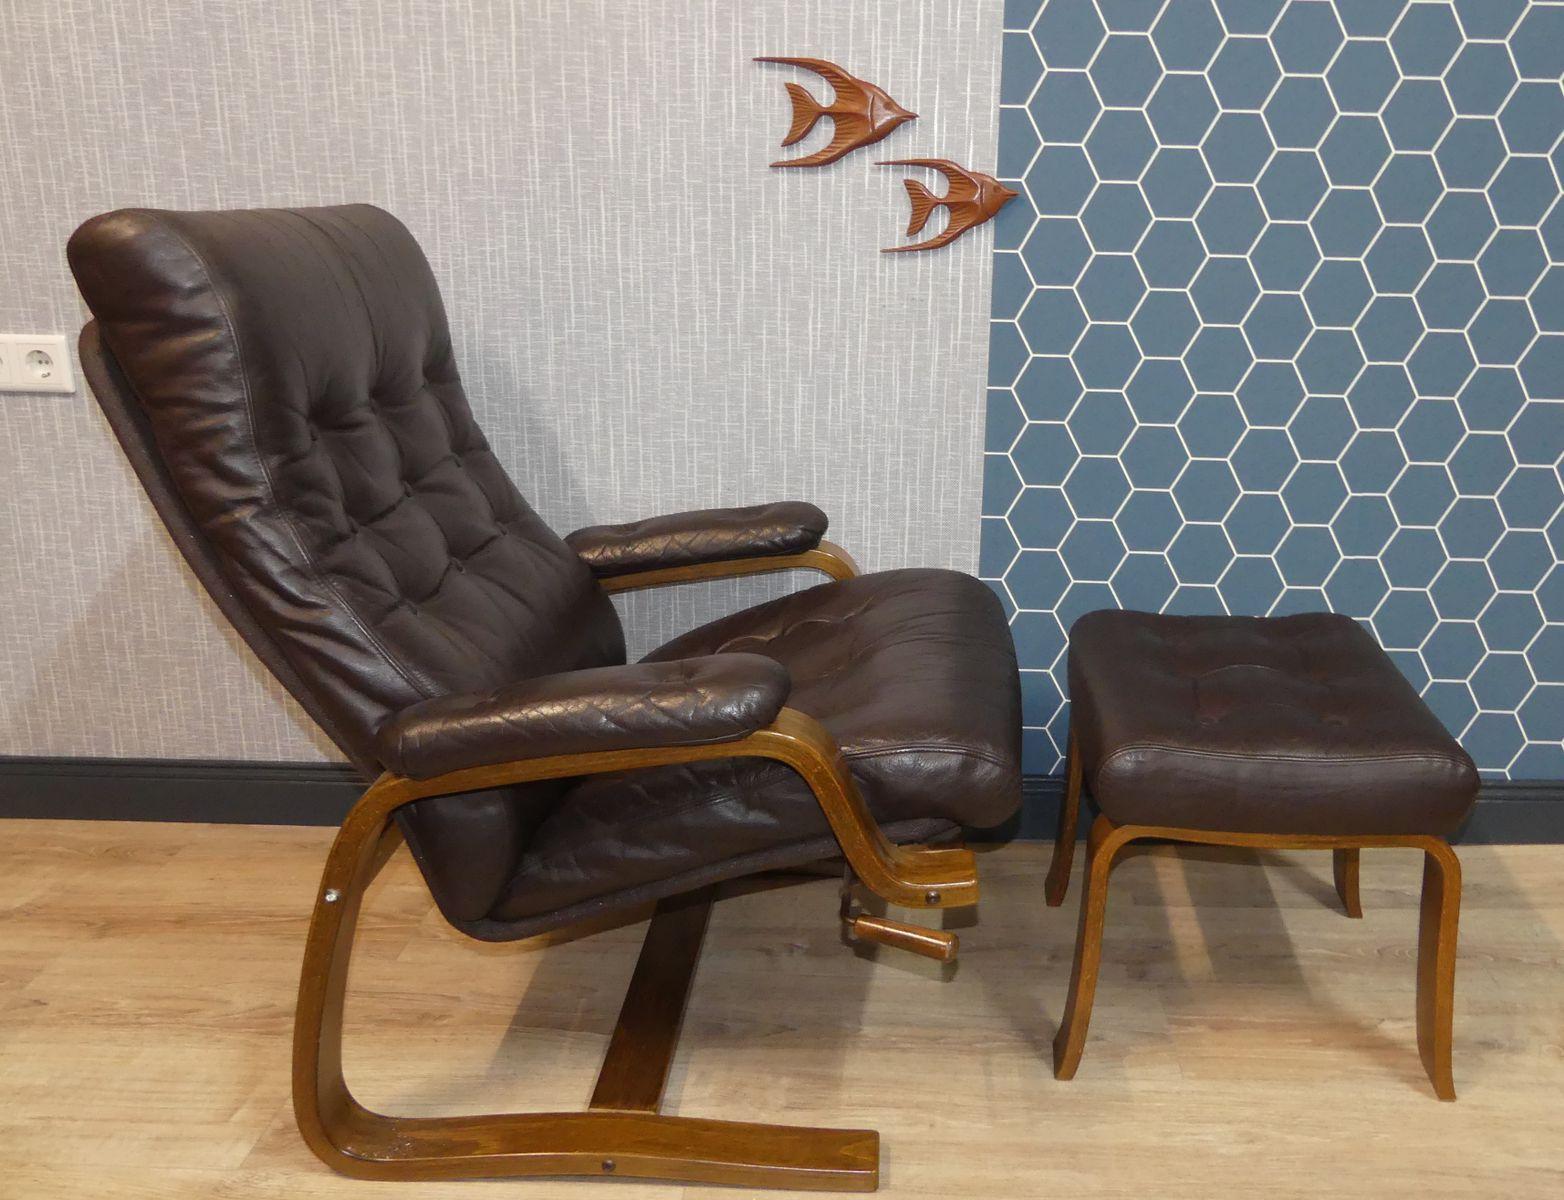 skulpturaler vintage bronze cocktail tisch von victor roman aws velbert. Black Bedroom Furniture Sets. Home Design Ideas